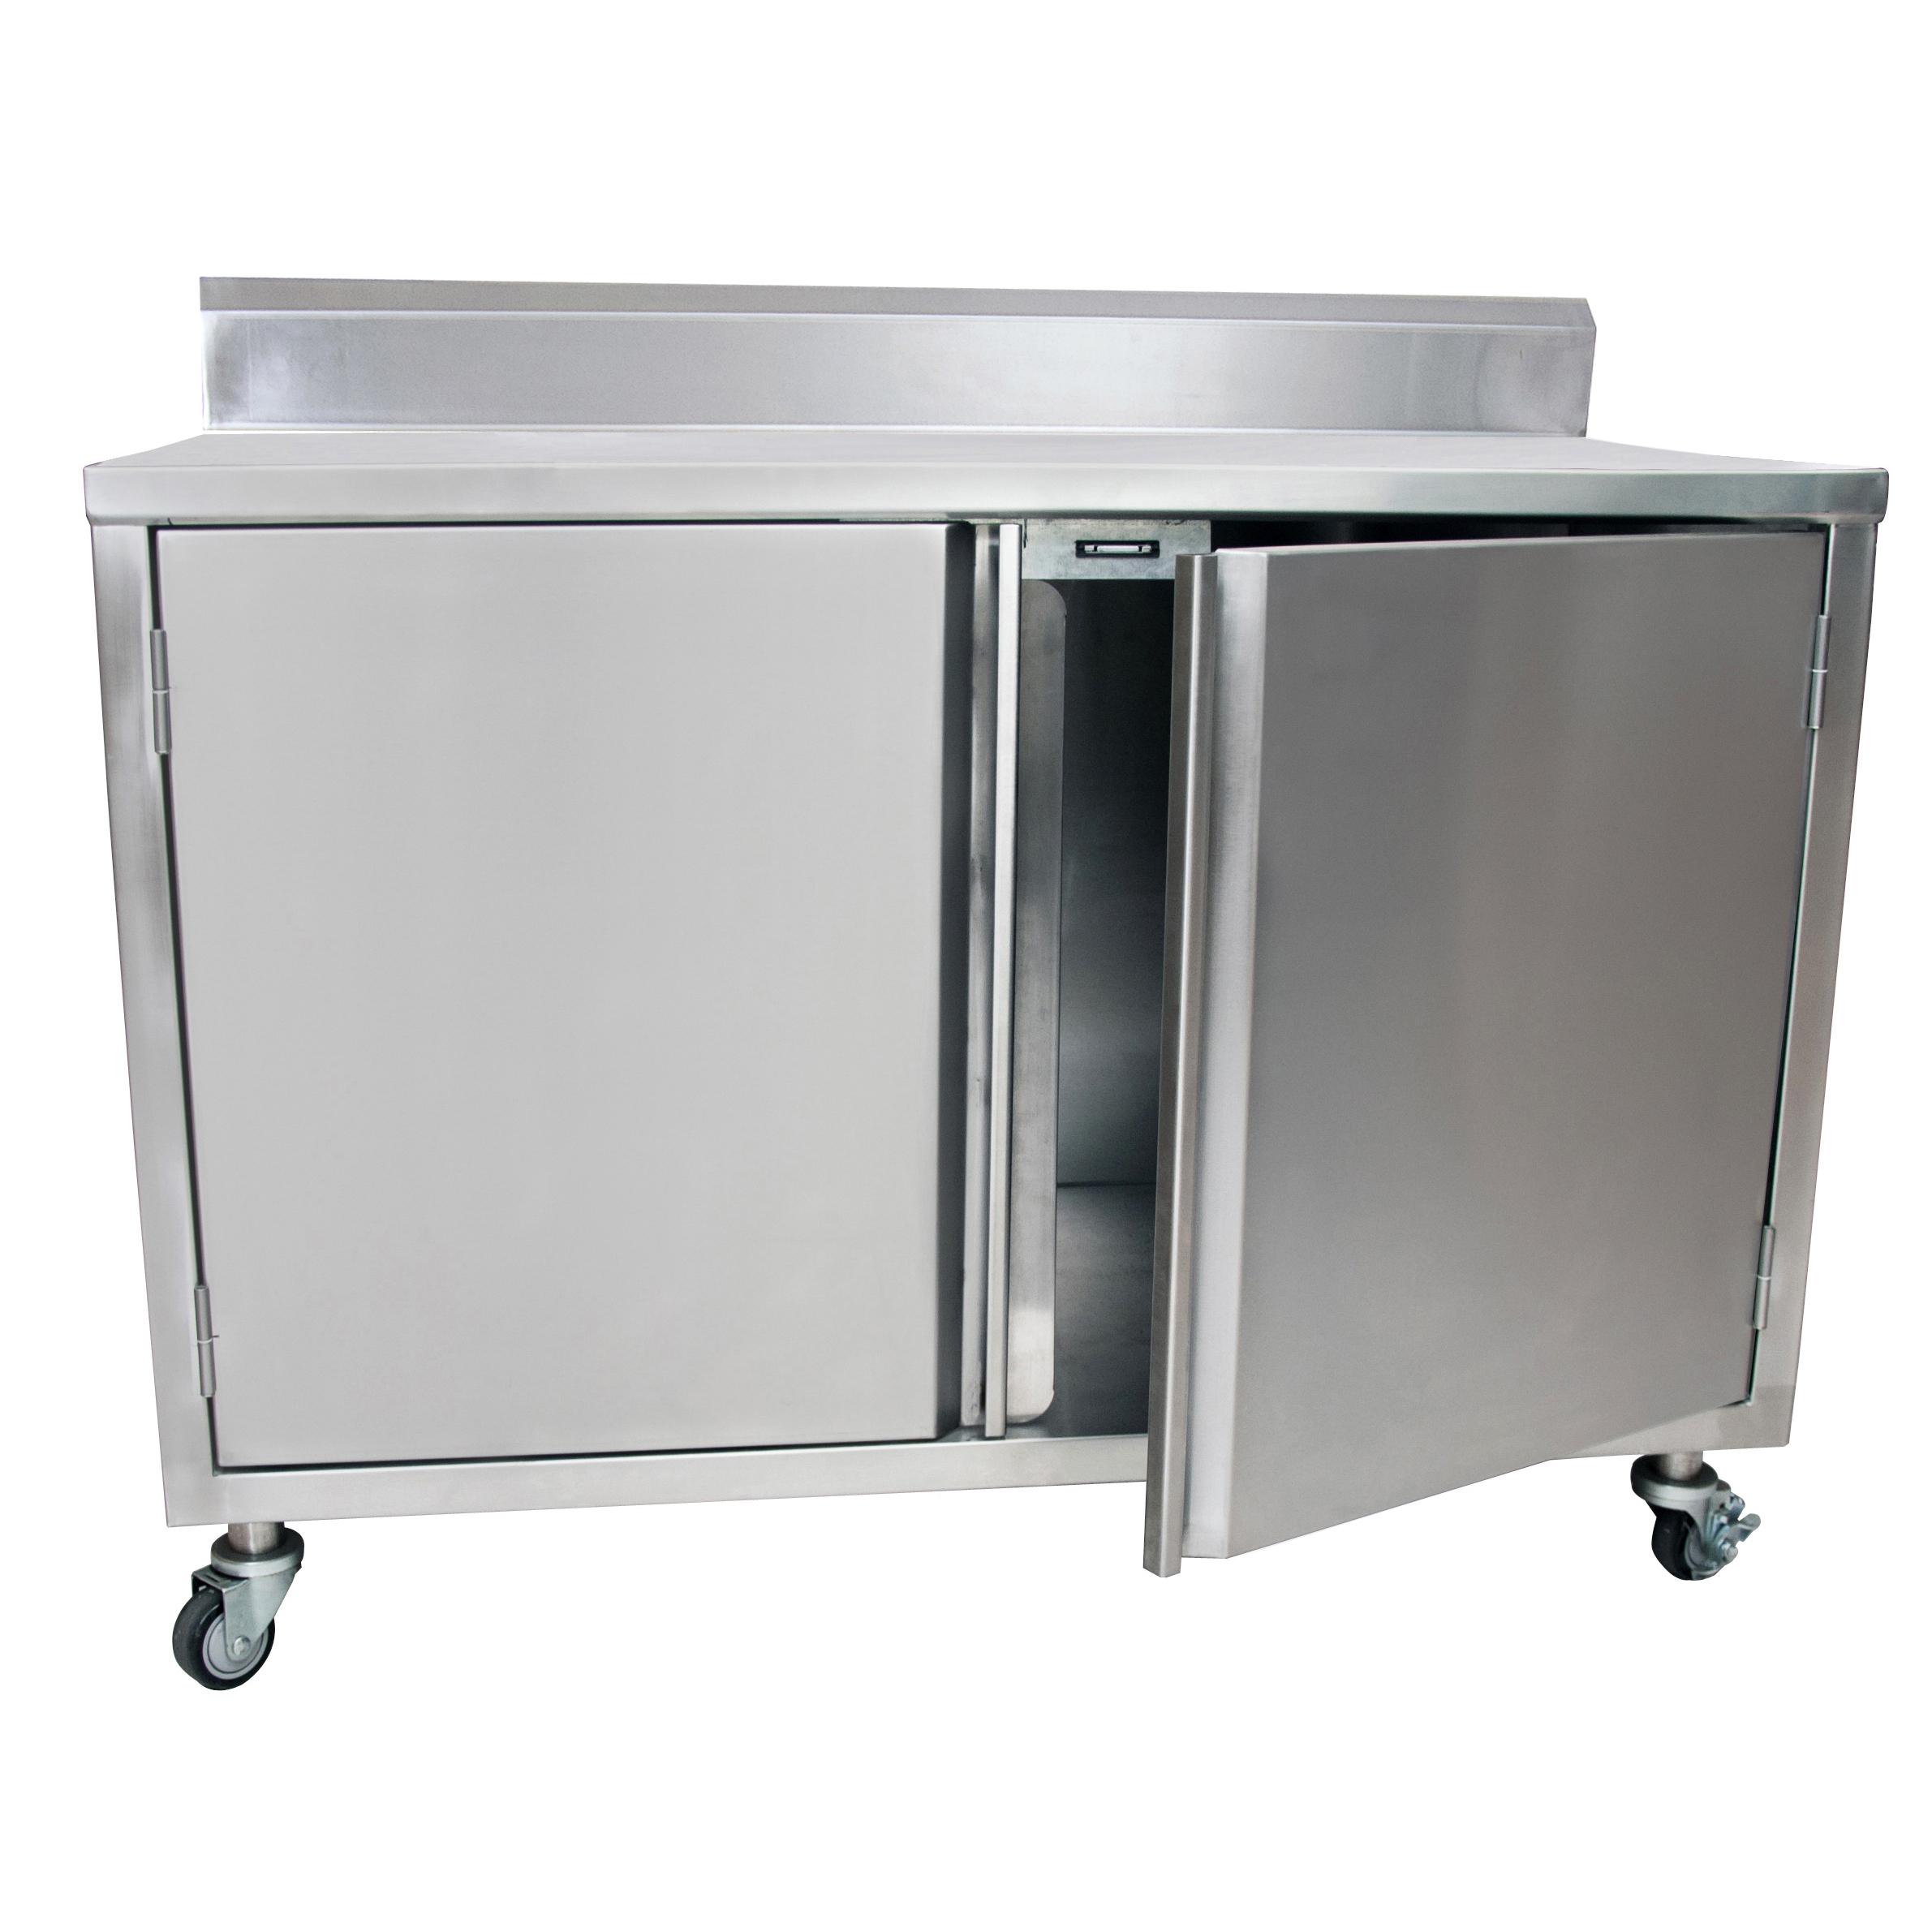 BK Resources BKDCR5-3018H work table, cabinet base hinged doors